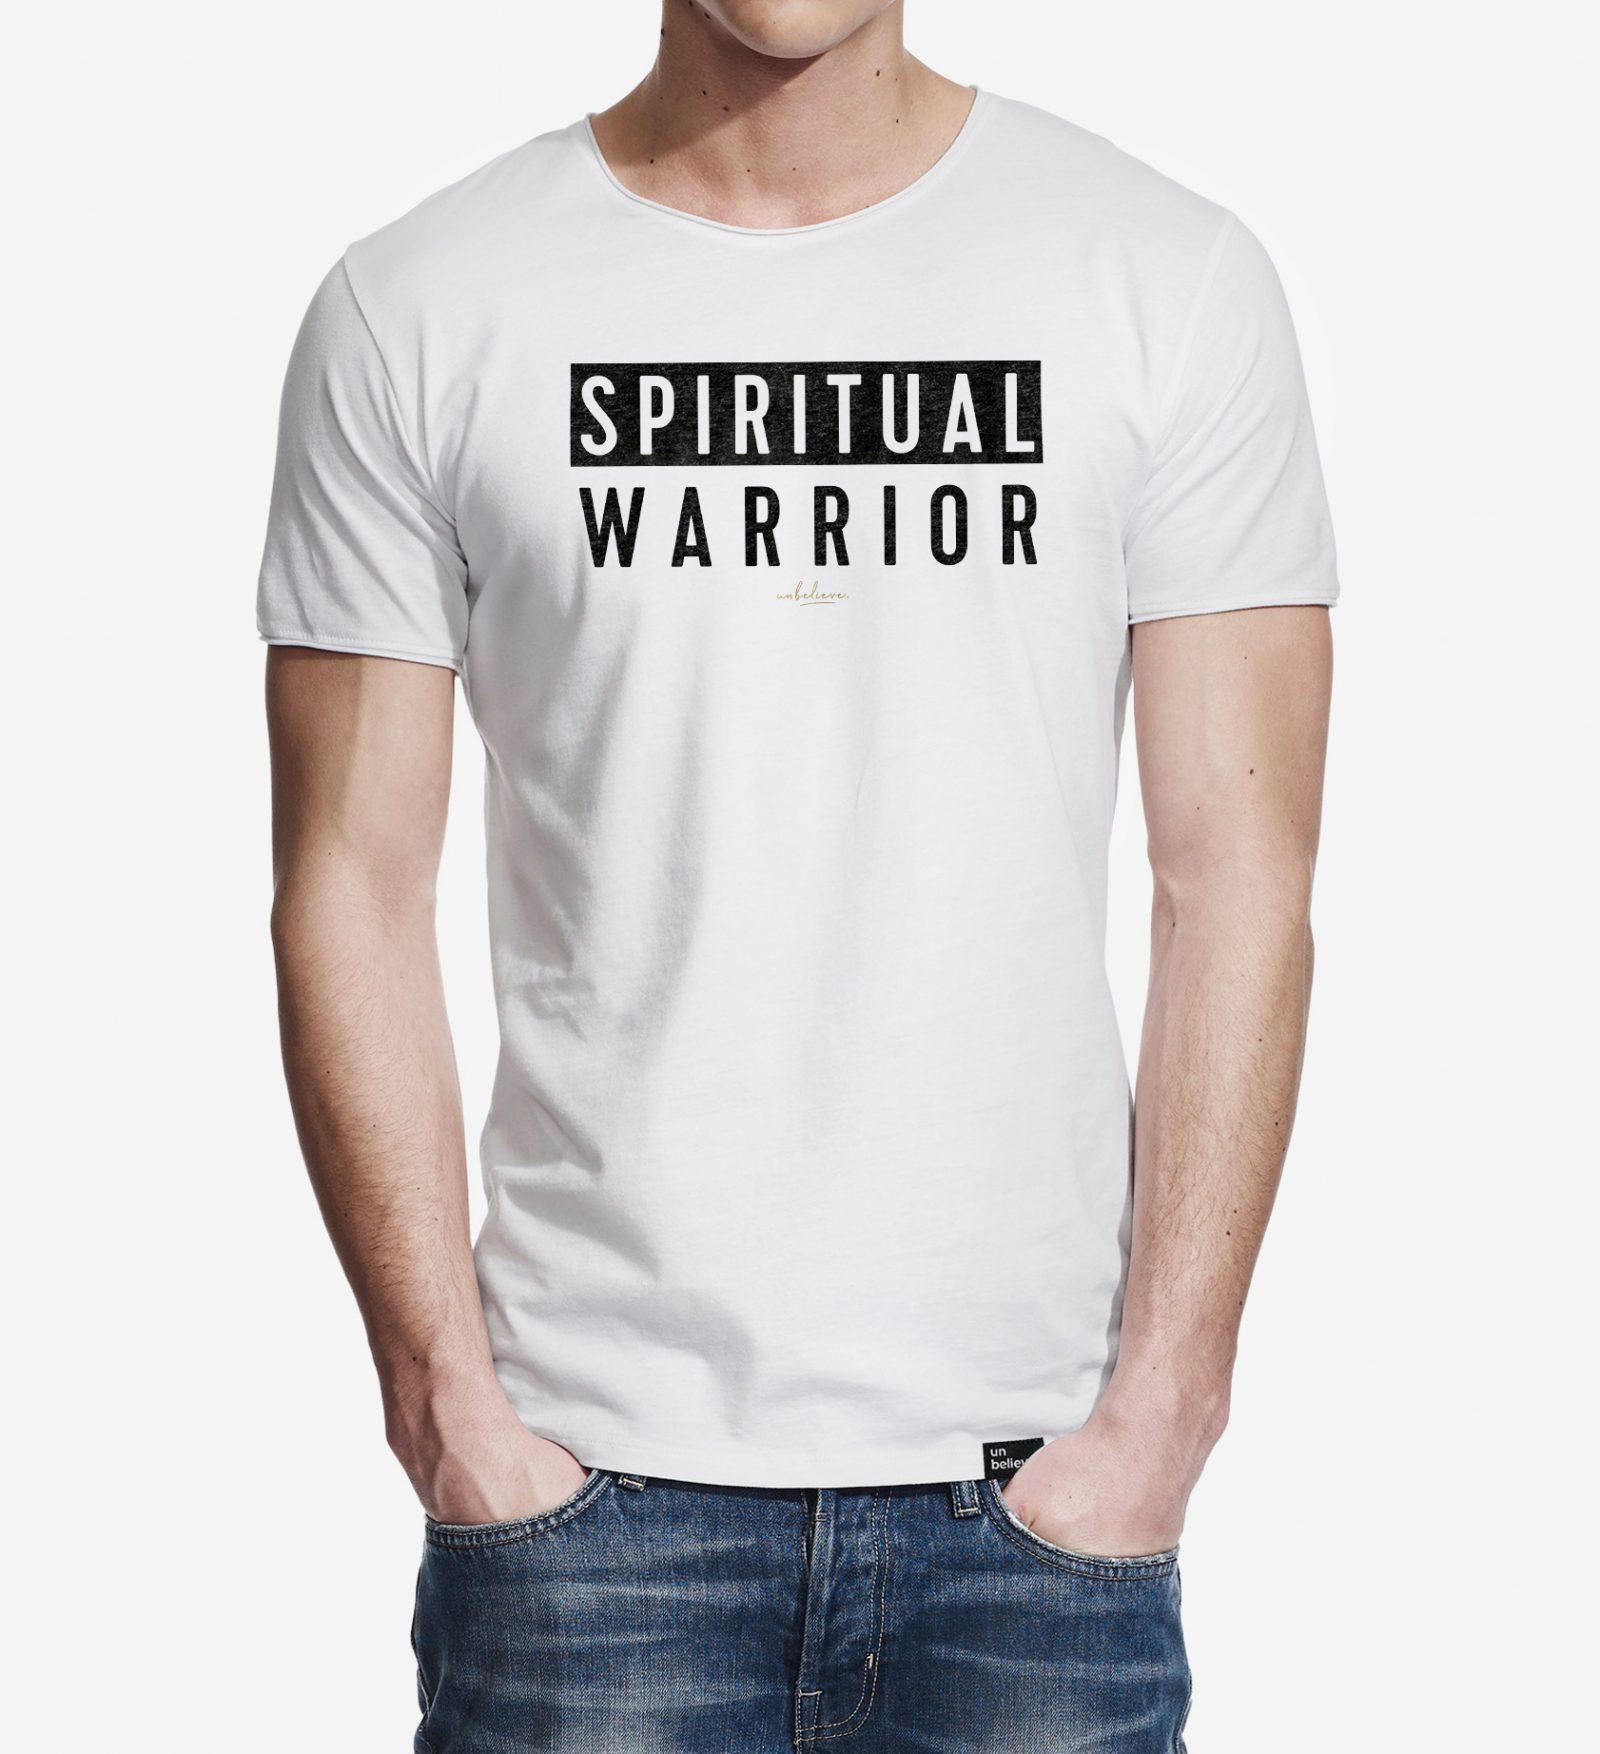 spiritualwarrior-shirt